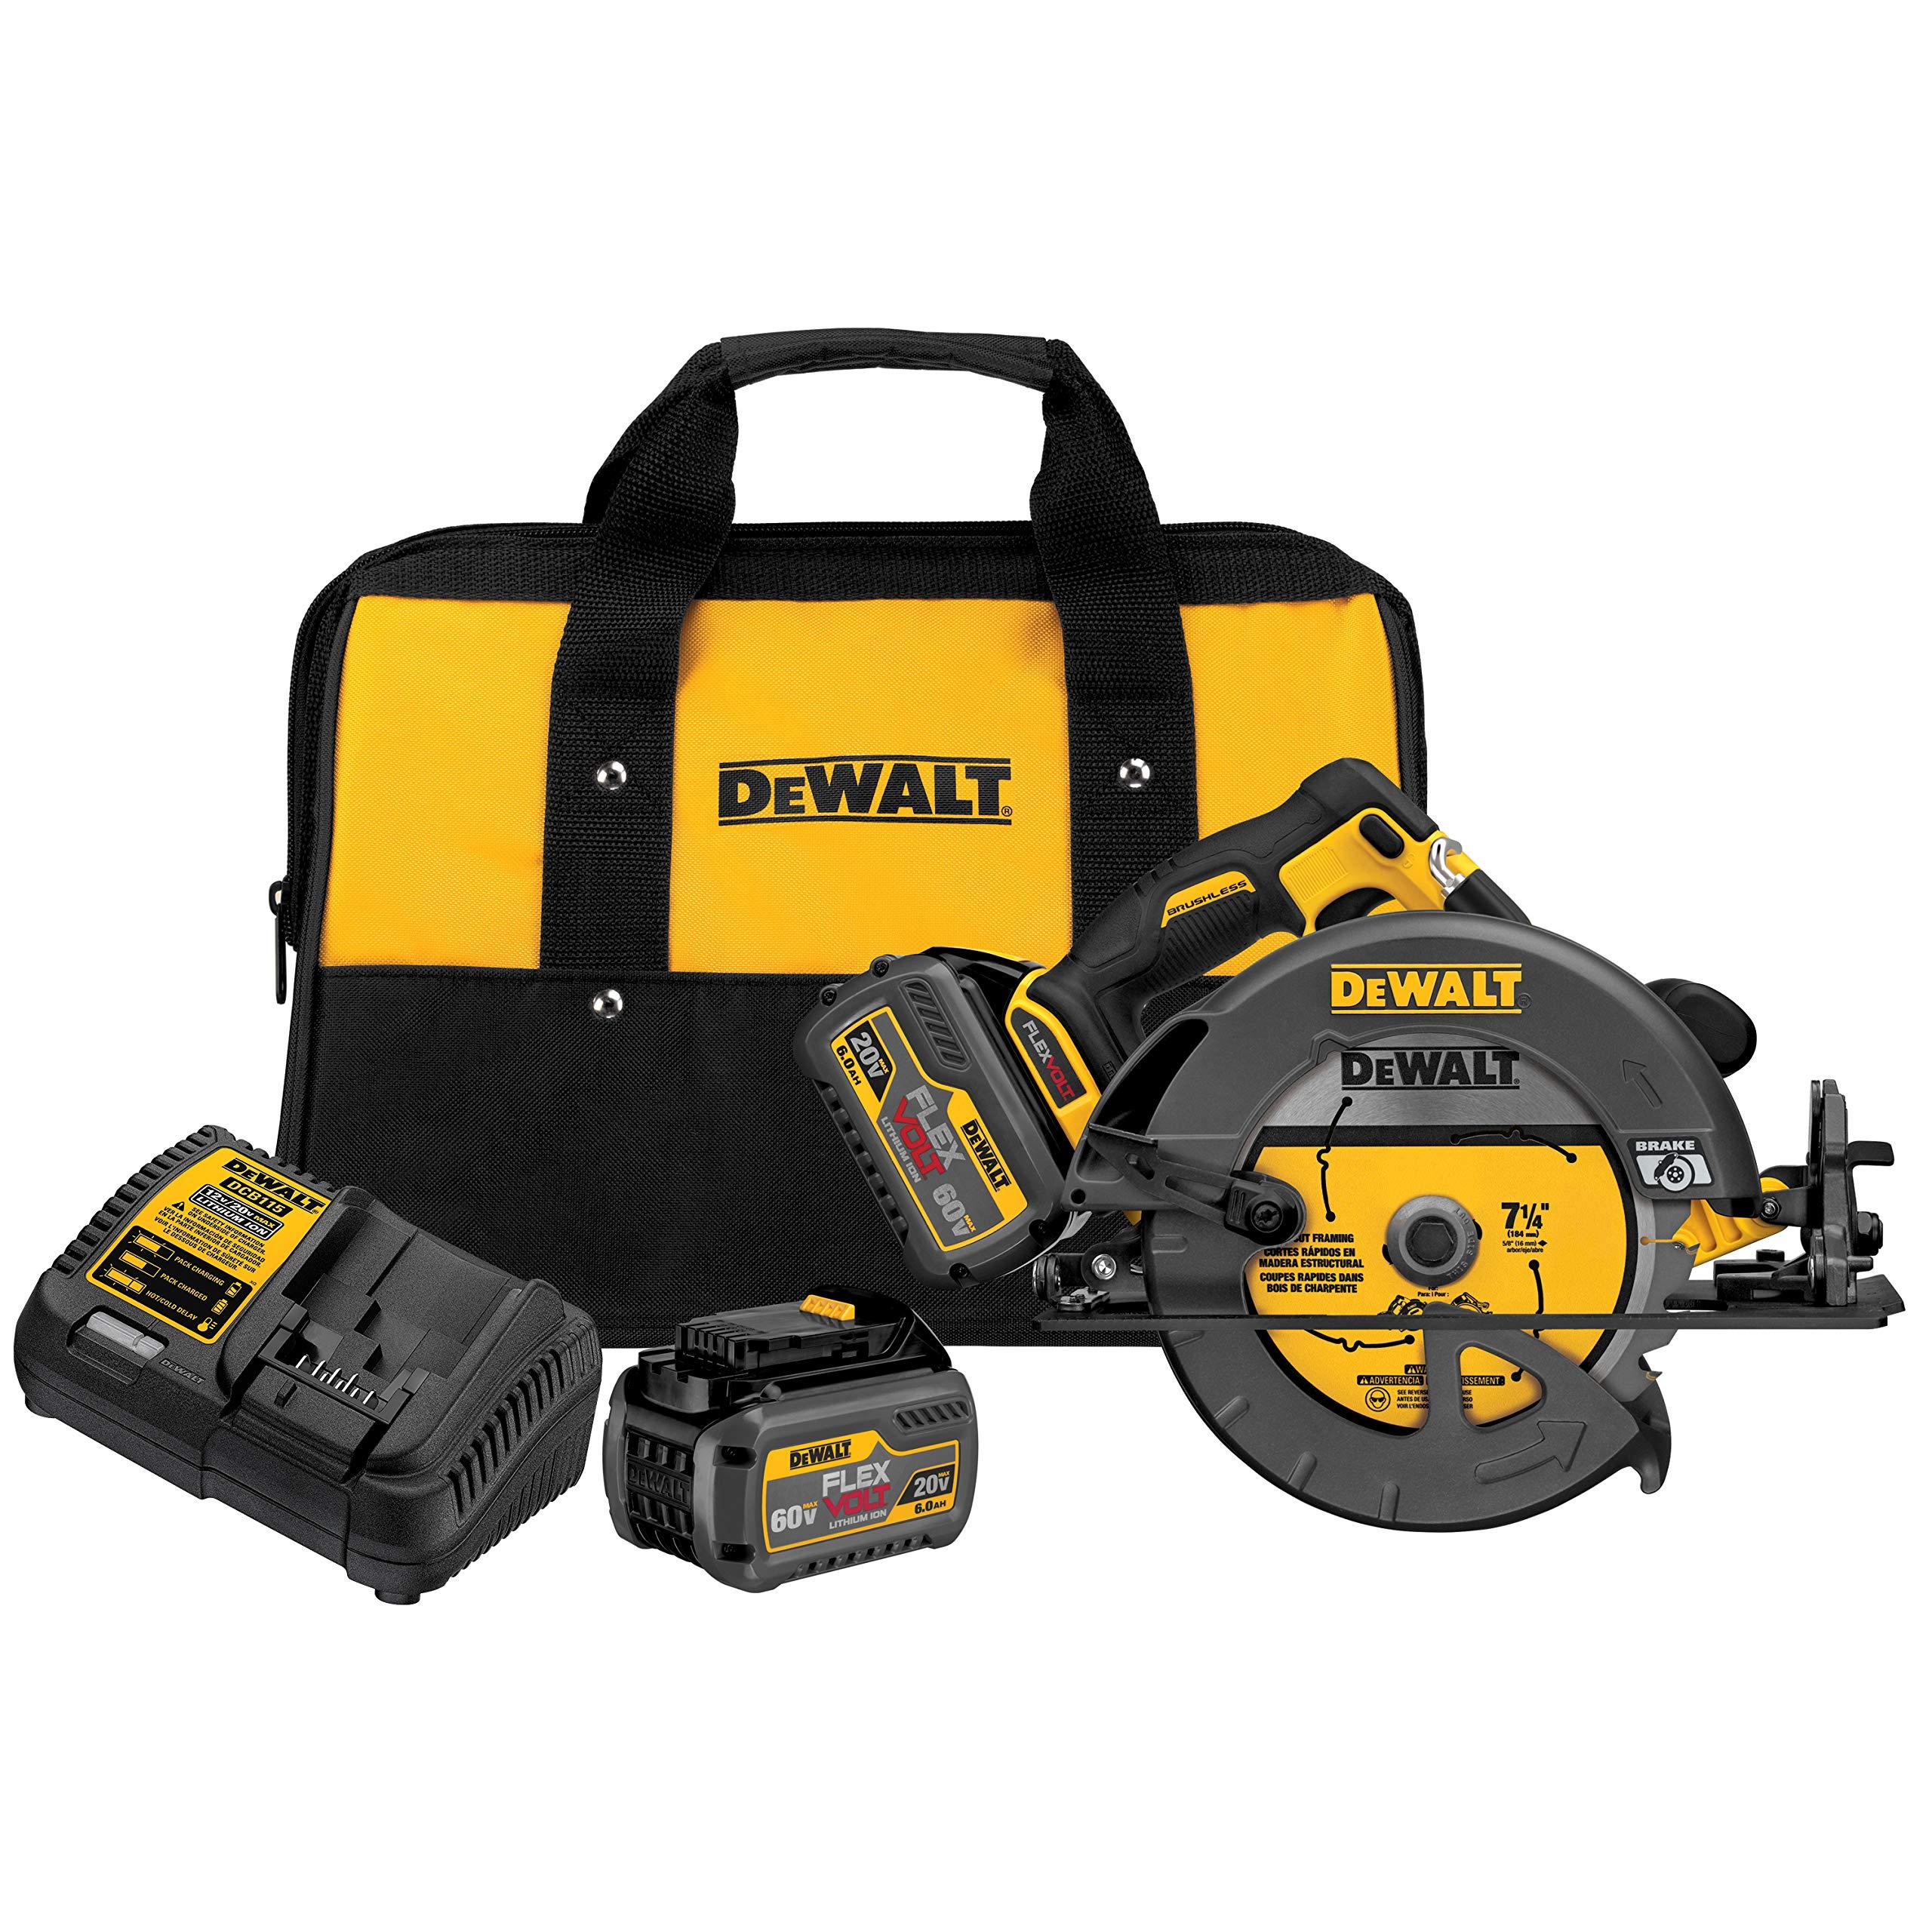 DEWALT DCS575T2 FLEXVOLT 60V MAX Brushless Circular Saw with Brake and 2 Battery Kit, 7-1/4''